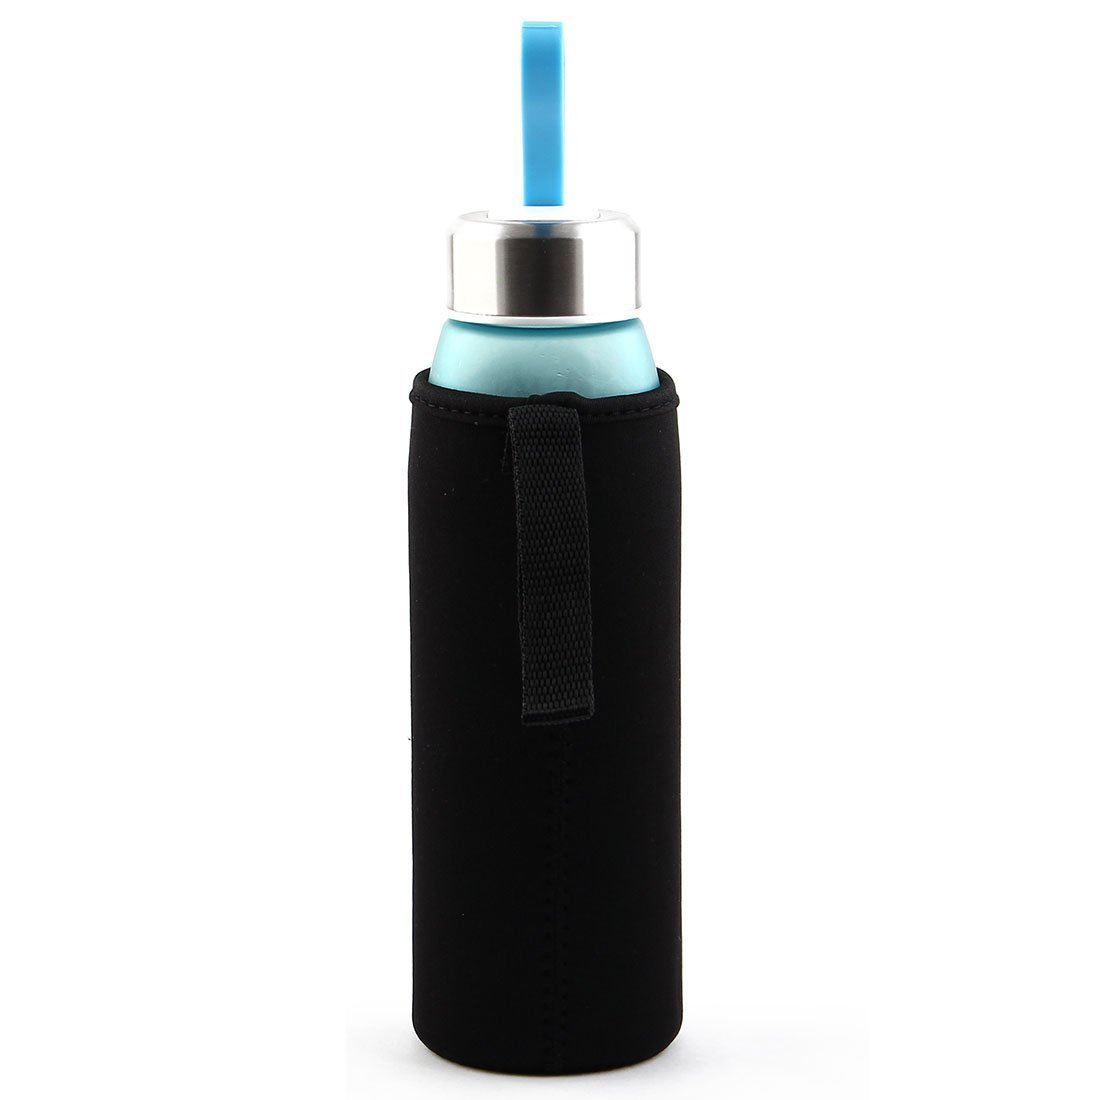 Amazon.com: eDealMax Spandex Inicio térmicamente aislada Manos protector reutilizable taza de cristal de la manga de la Copa Negro: Kitchen & Dining